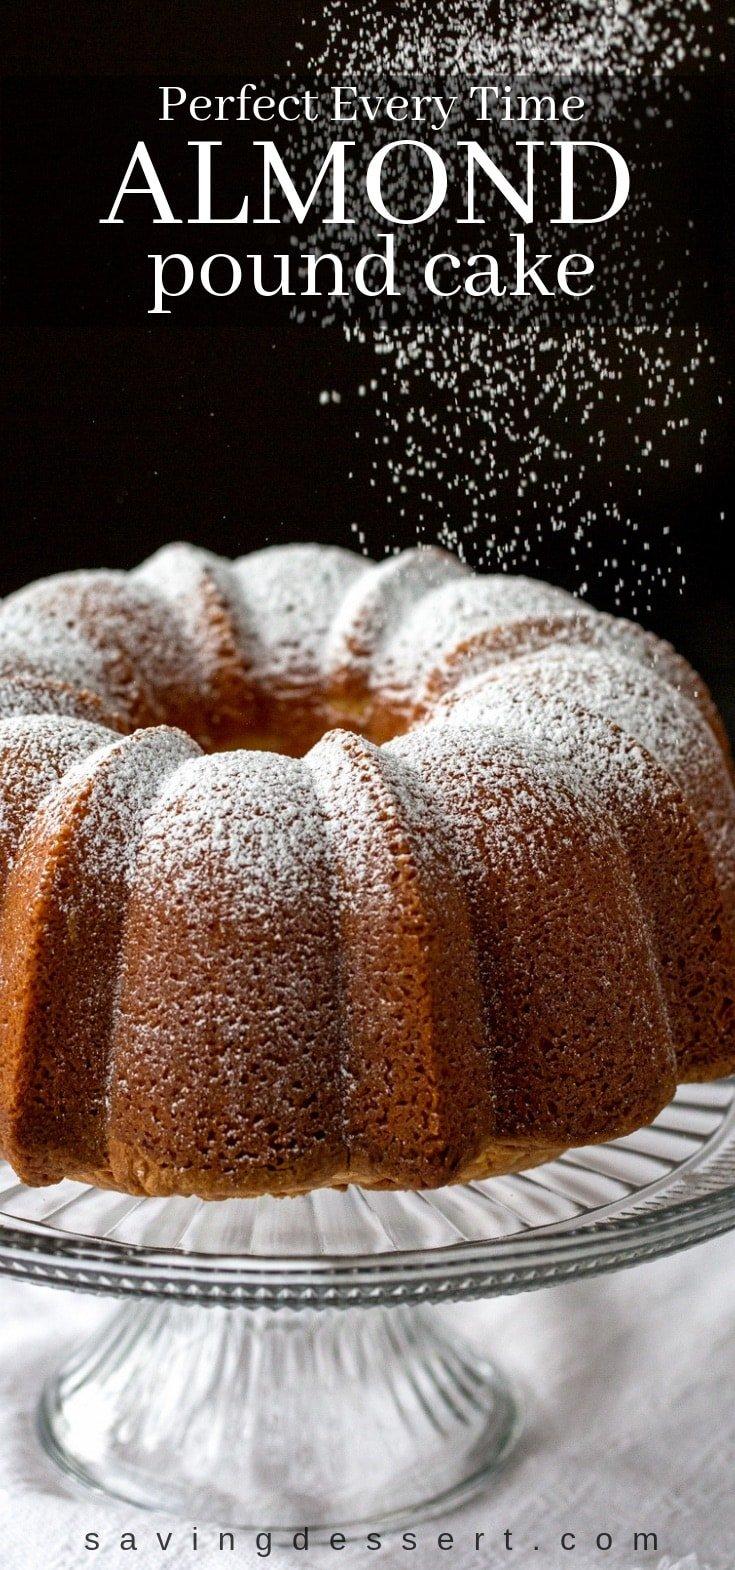 Pound cake sprinkled with powdered sugar